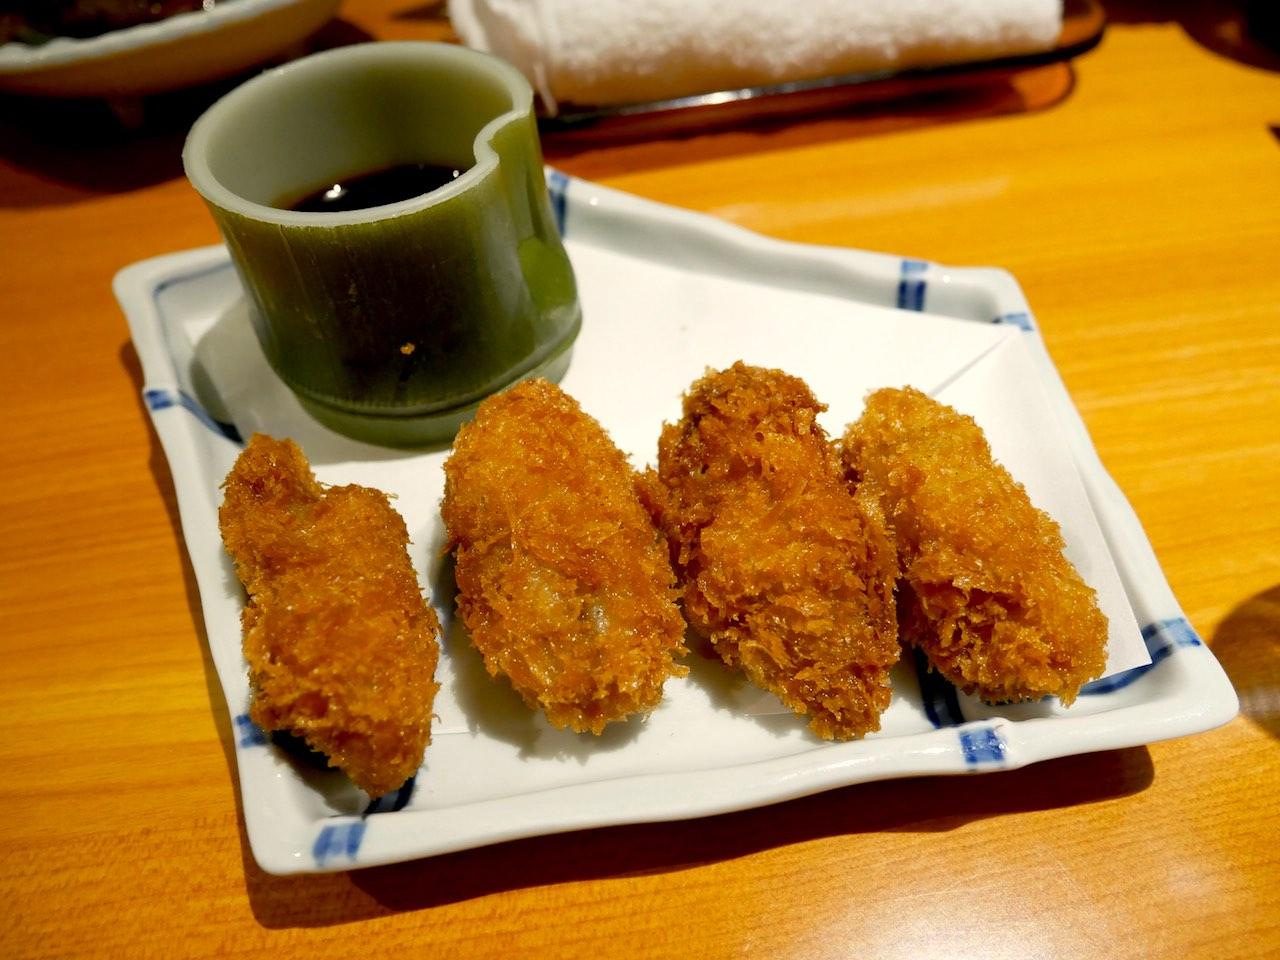 http://dinner.tokyo-review.com/images/1030142.jpg